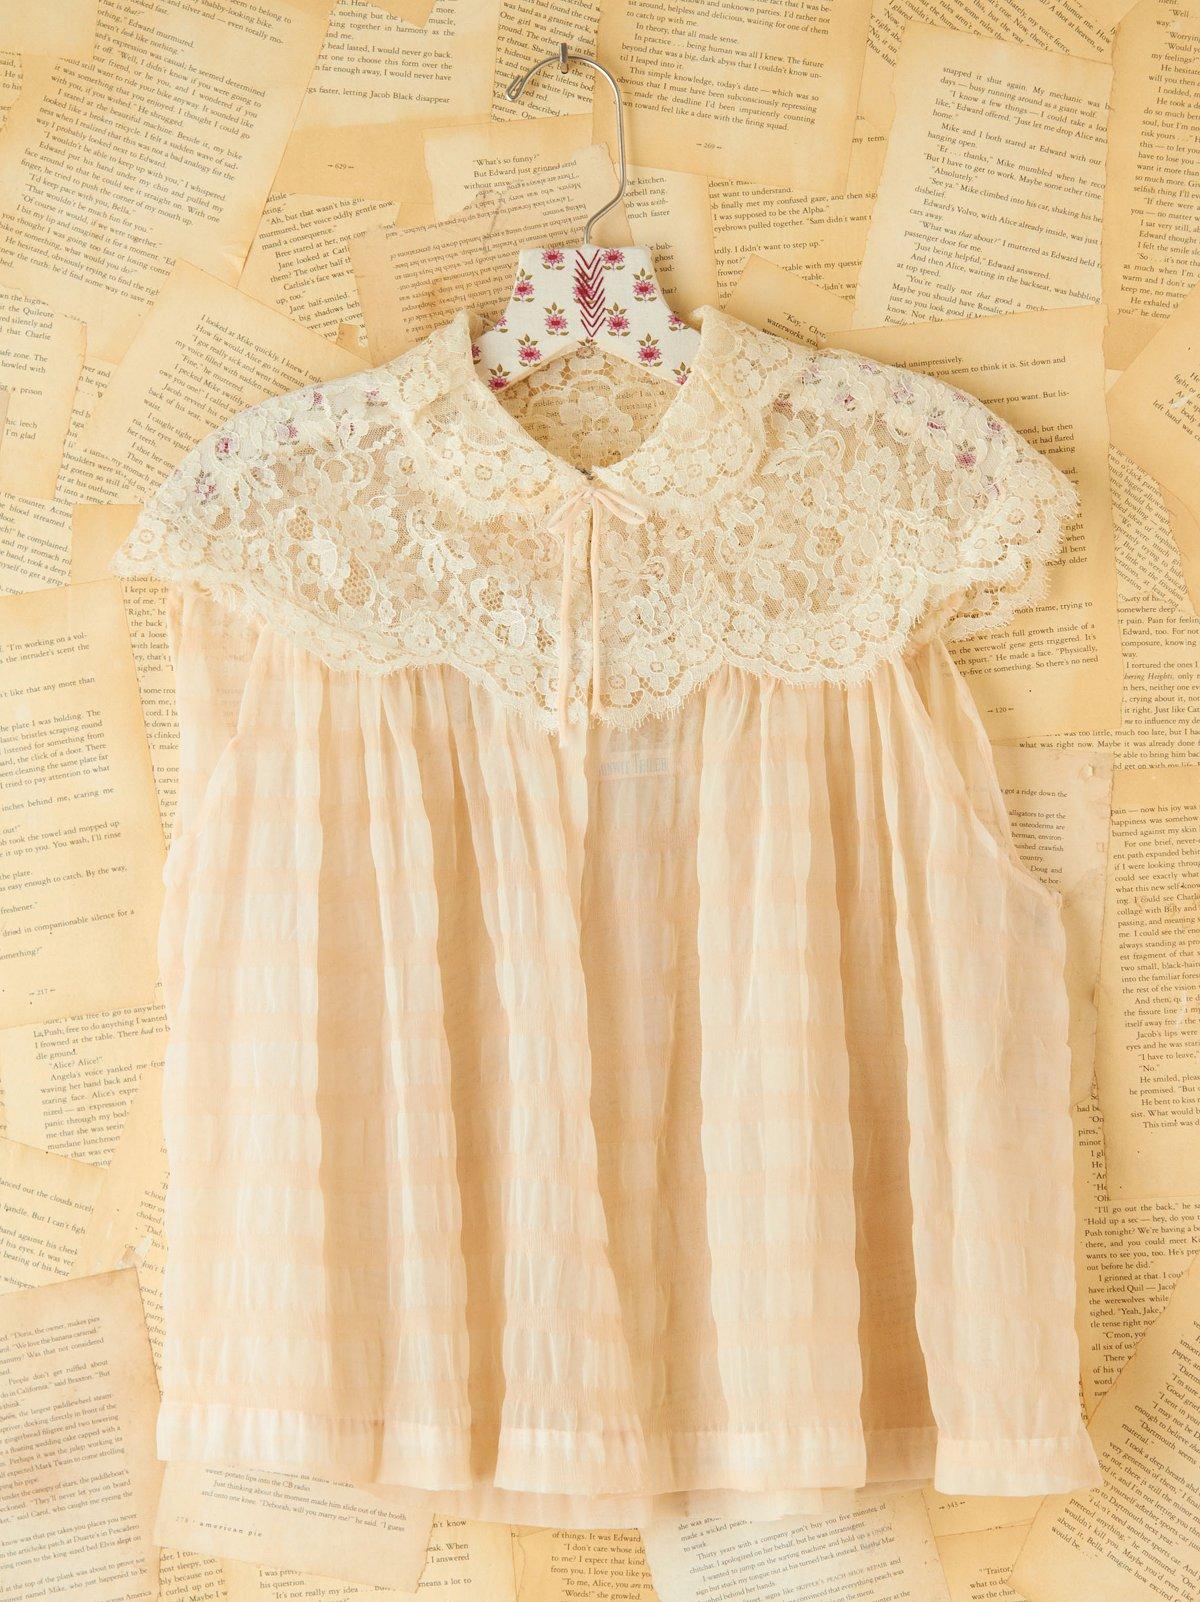 Vintage Sheer Lace Top